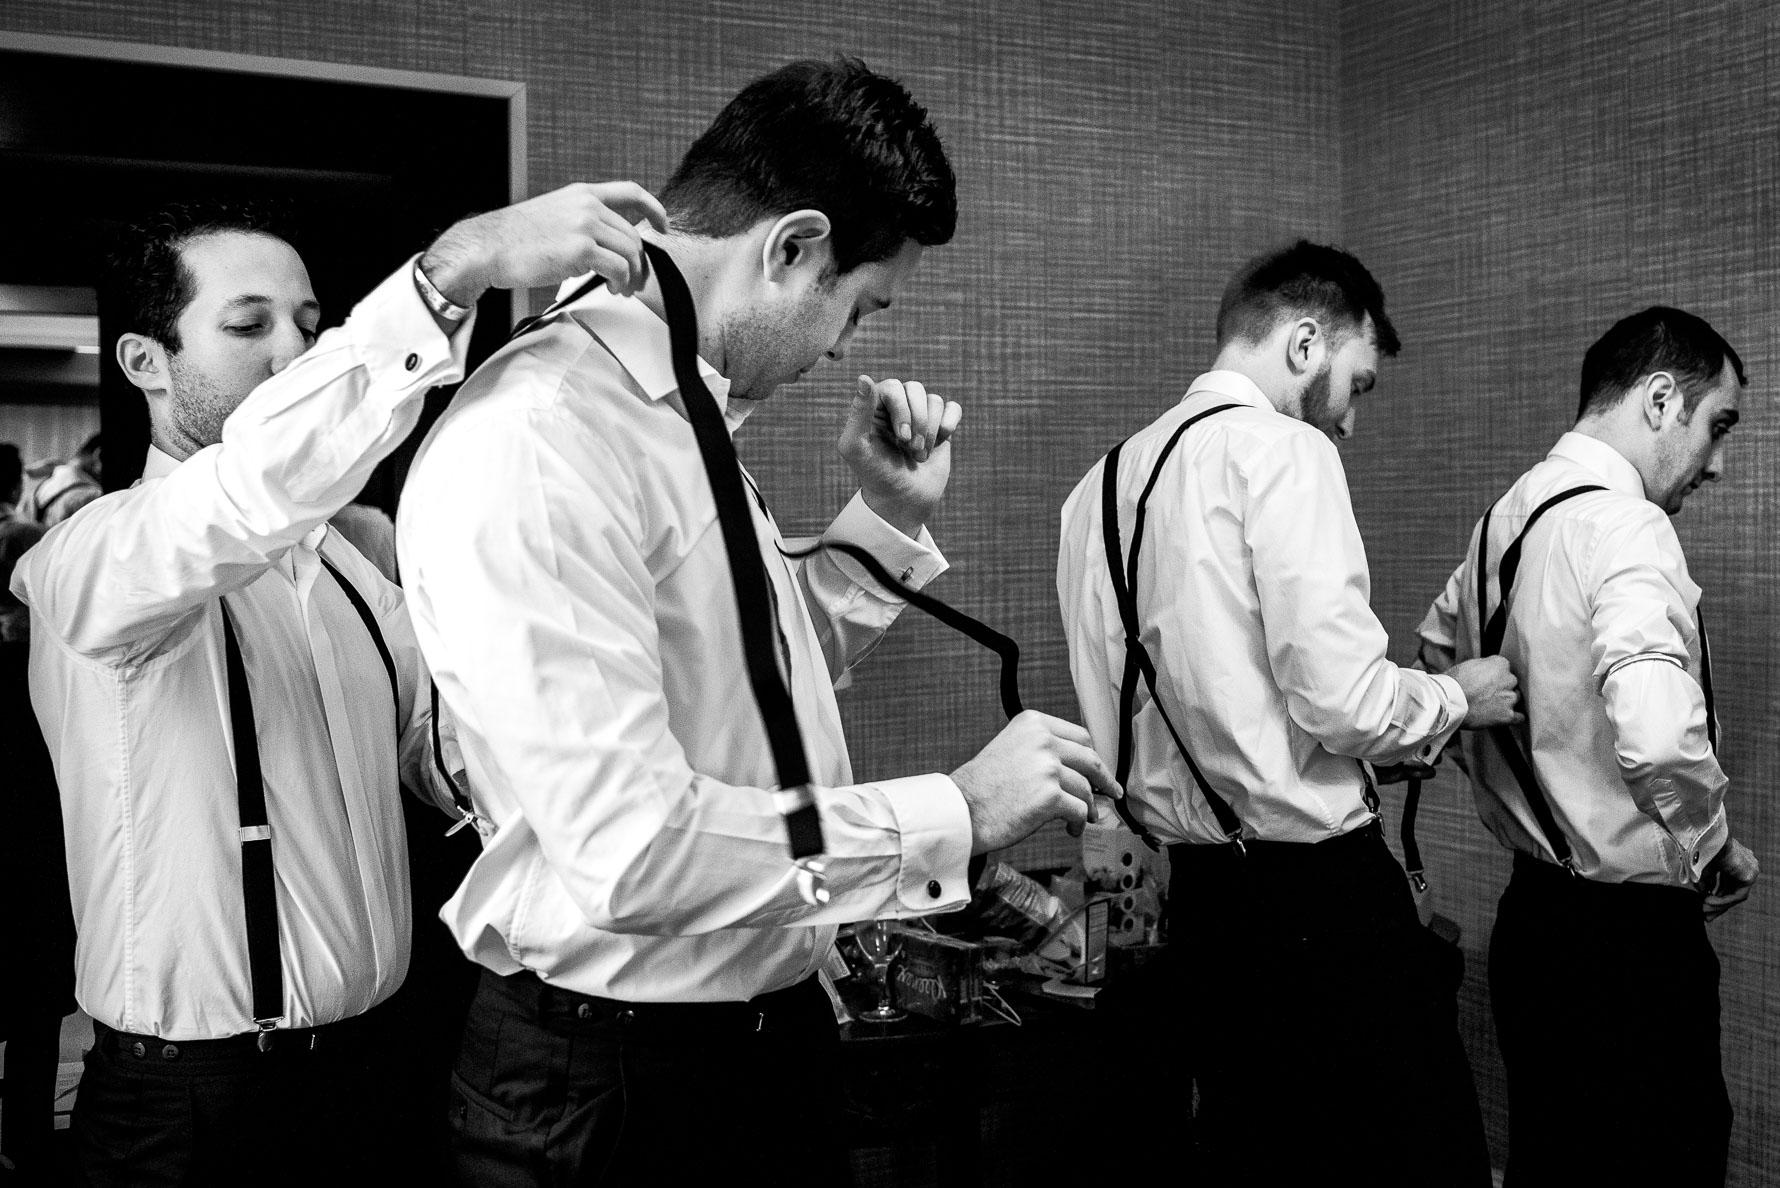 groomsmen getting ties and suits on